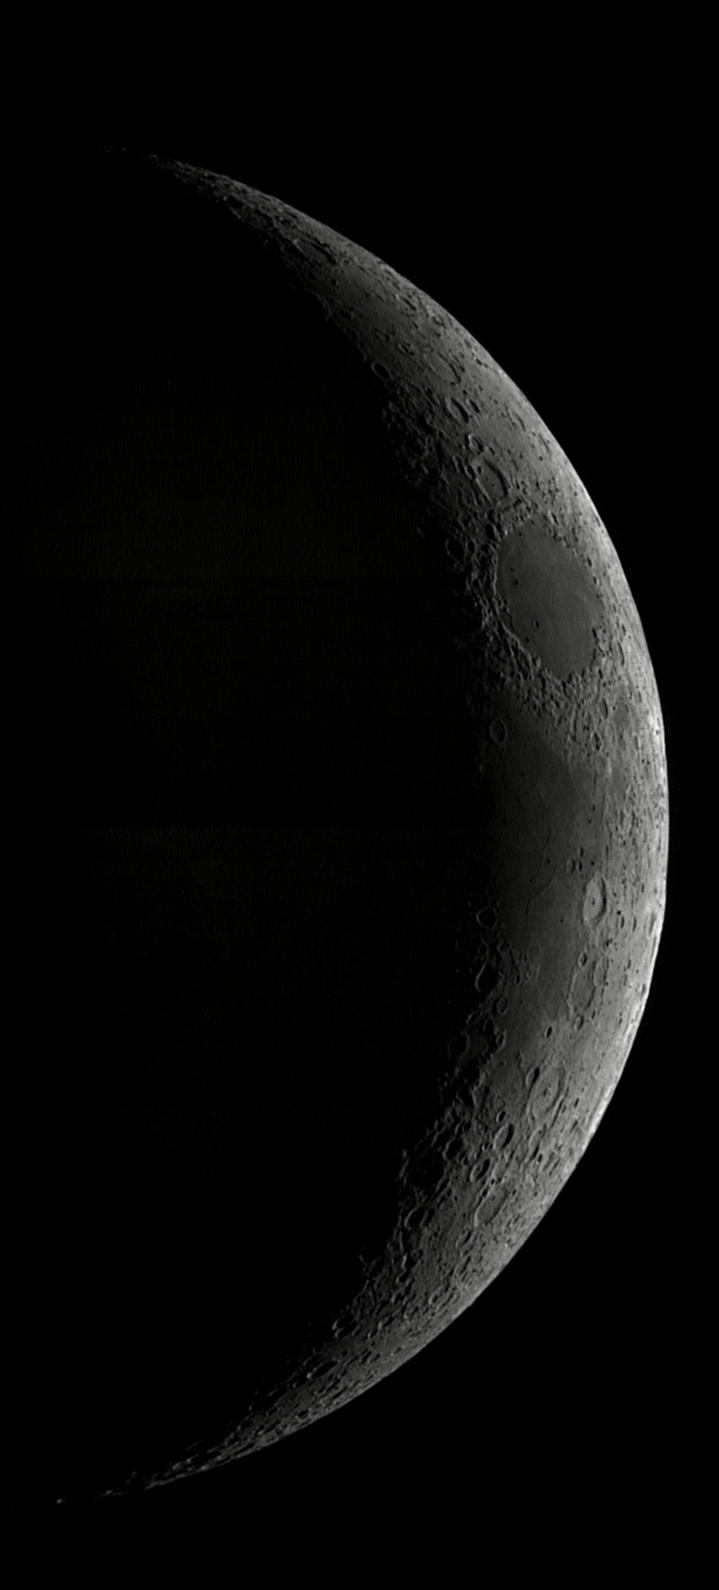 5cf9cbb6a935e_Moon_203938_060619_ZWOASI290MM_Vert_58_AS_P35_lapl4_ap54_stitch.jpg.a7a3bb74f60df31969338b3e277bced7.jpg